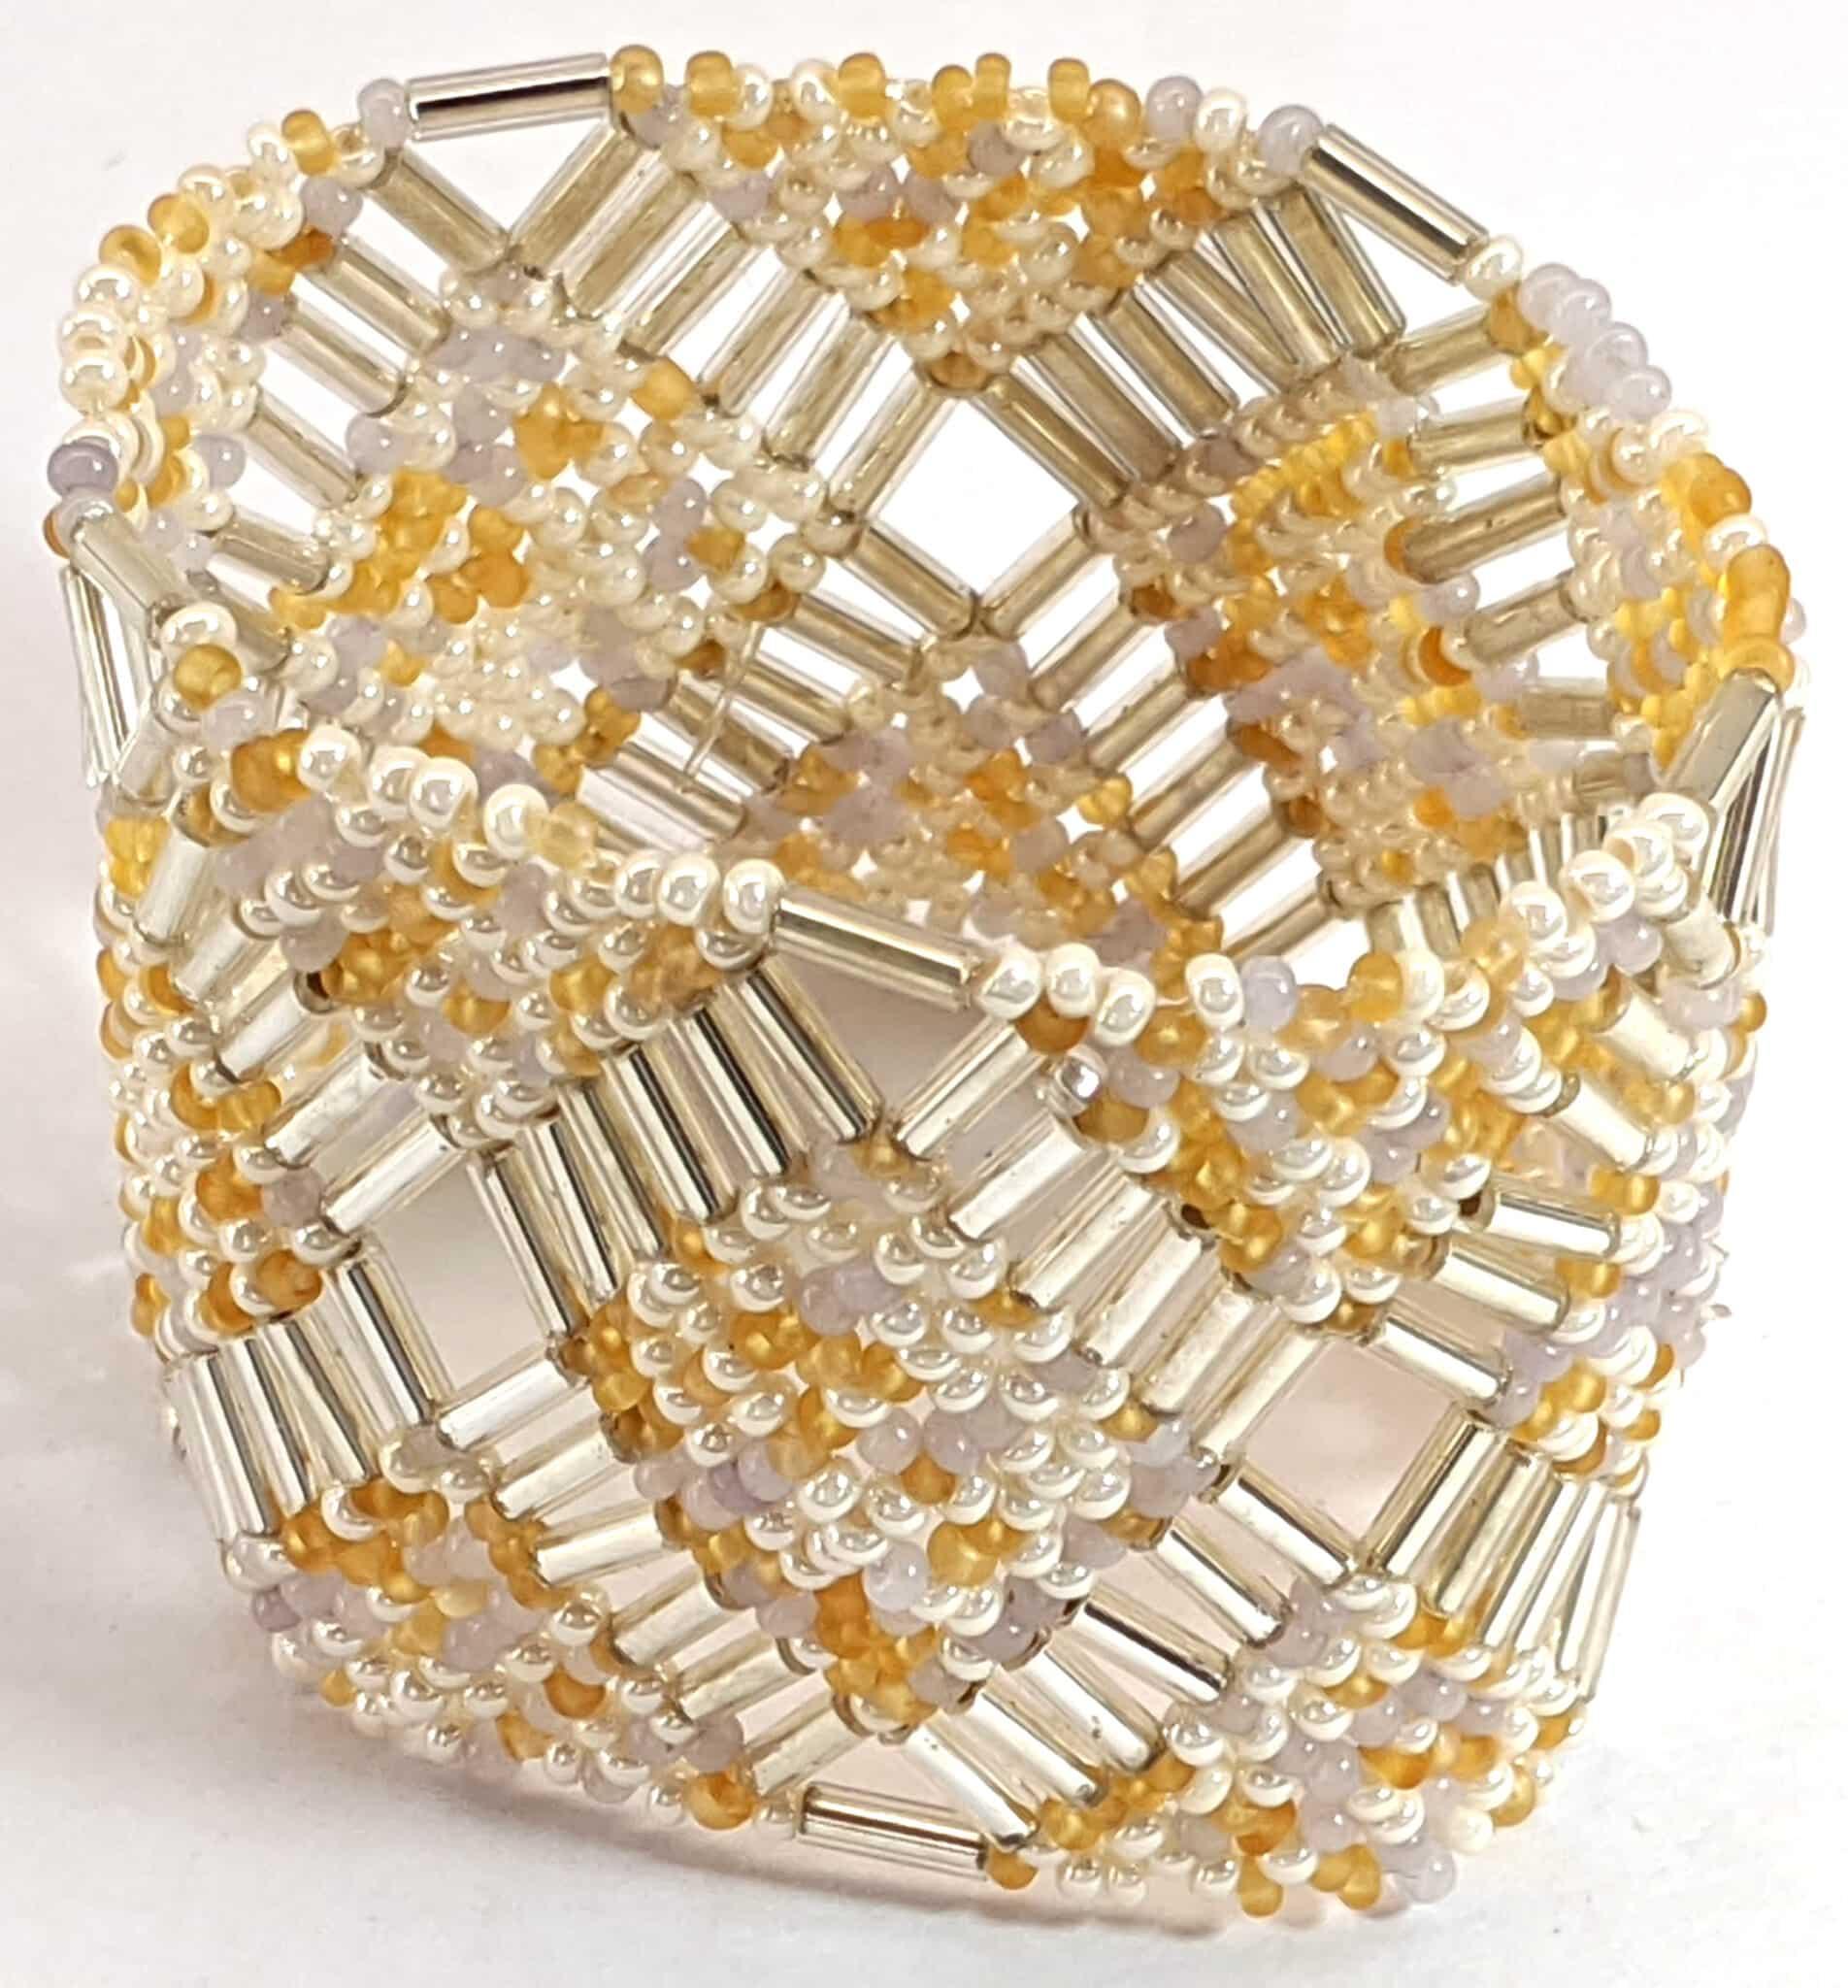 Beaded Elastic Geometric Cuff - Gold and Whites